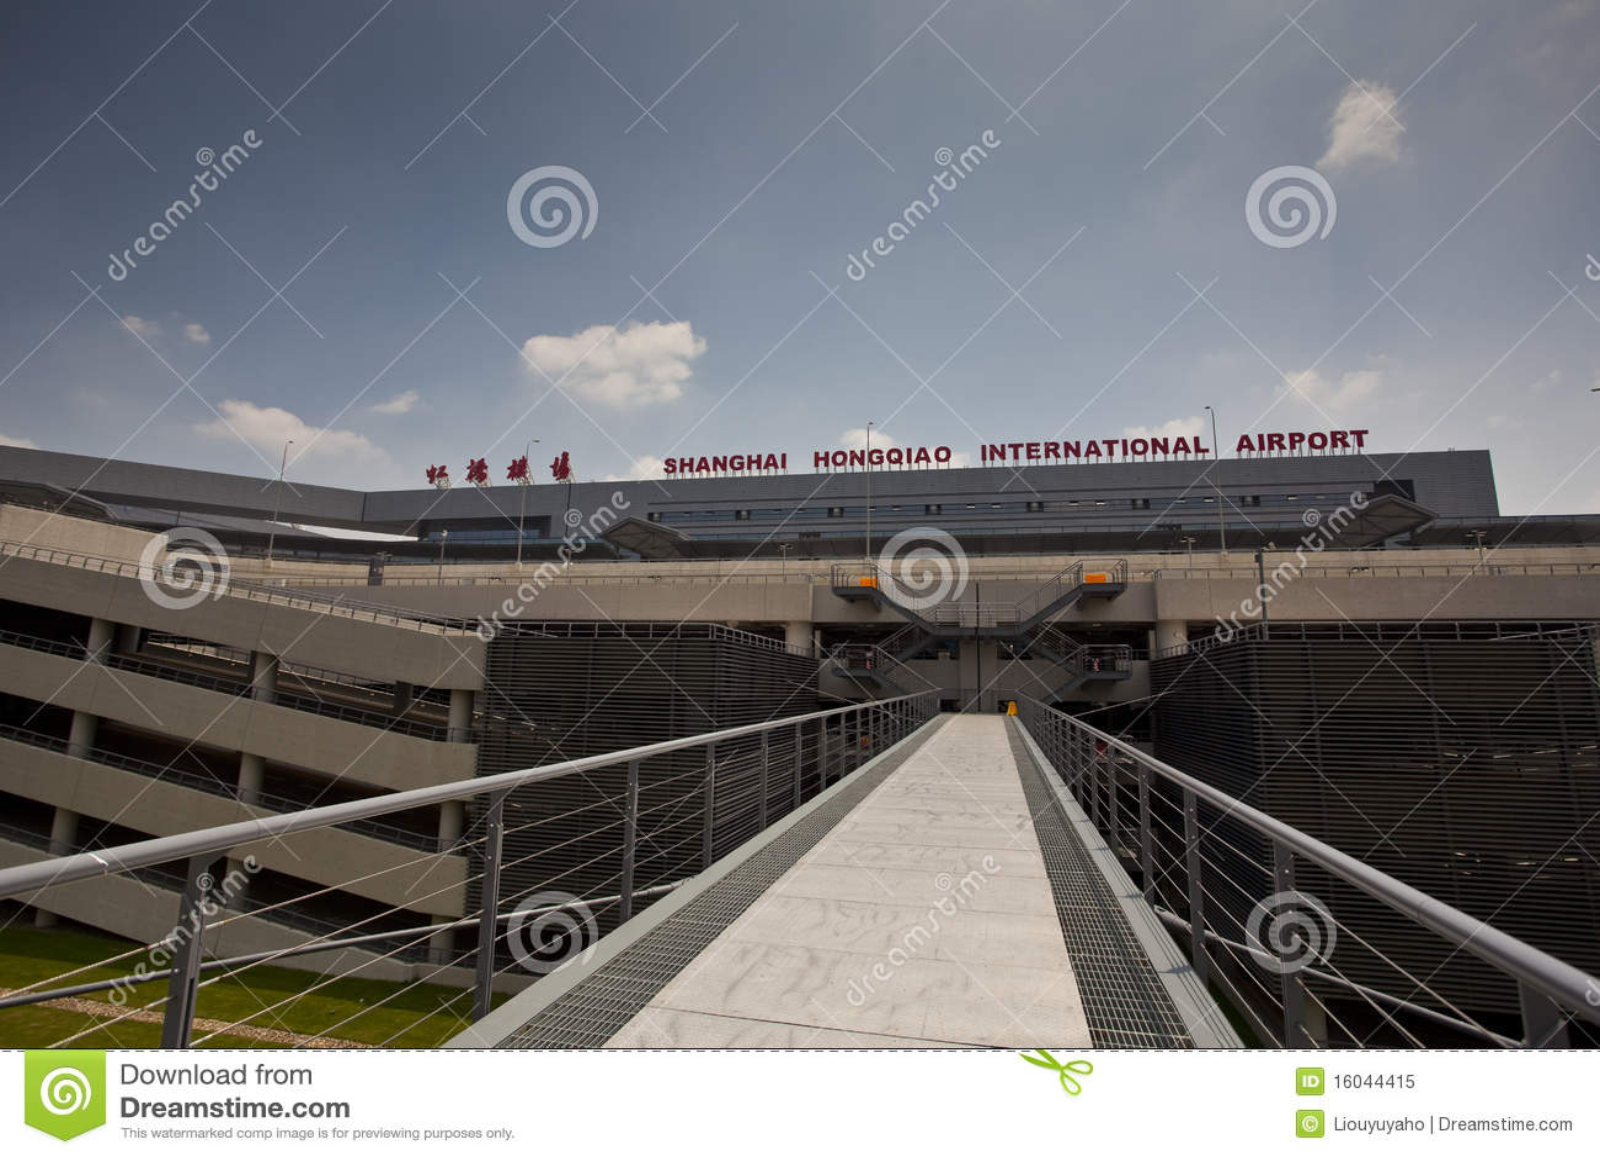 Shanghai Hongqiao Airport Royalty Free Stock Photo